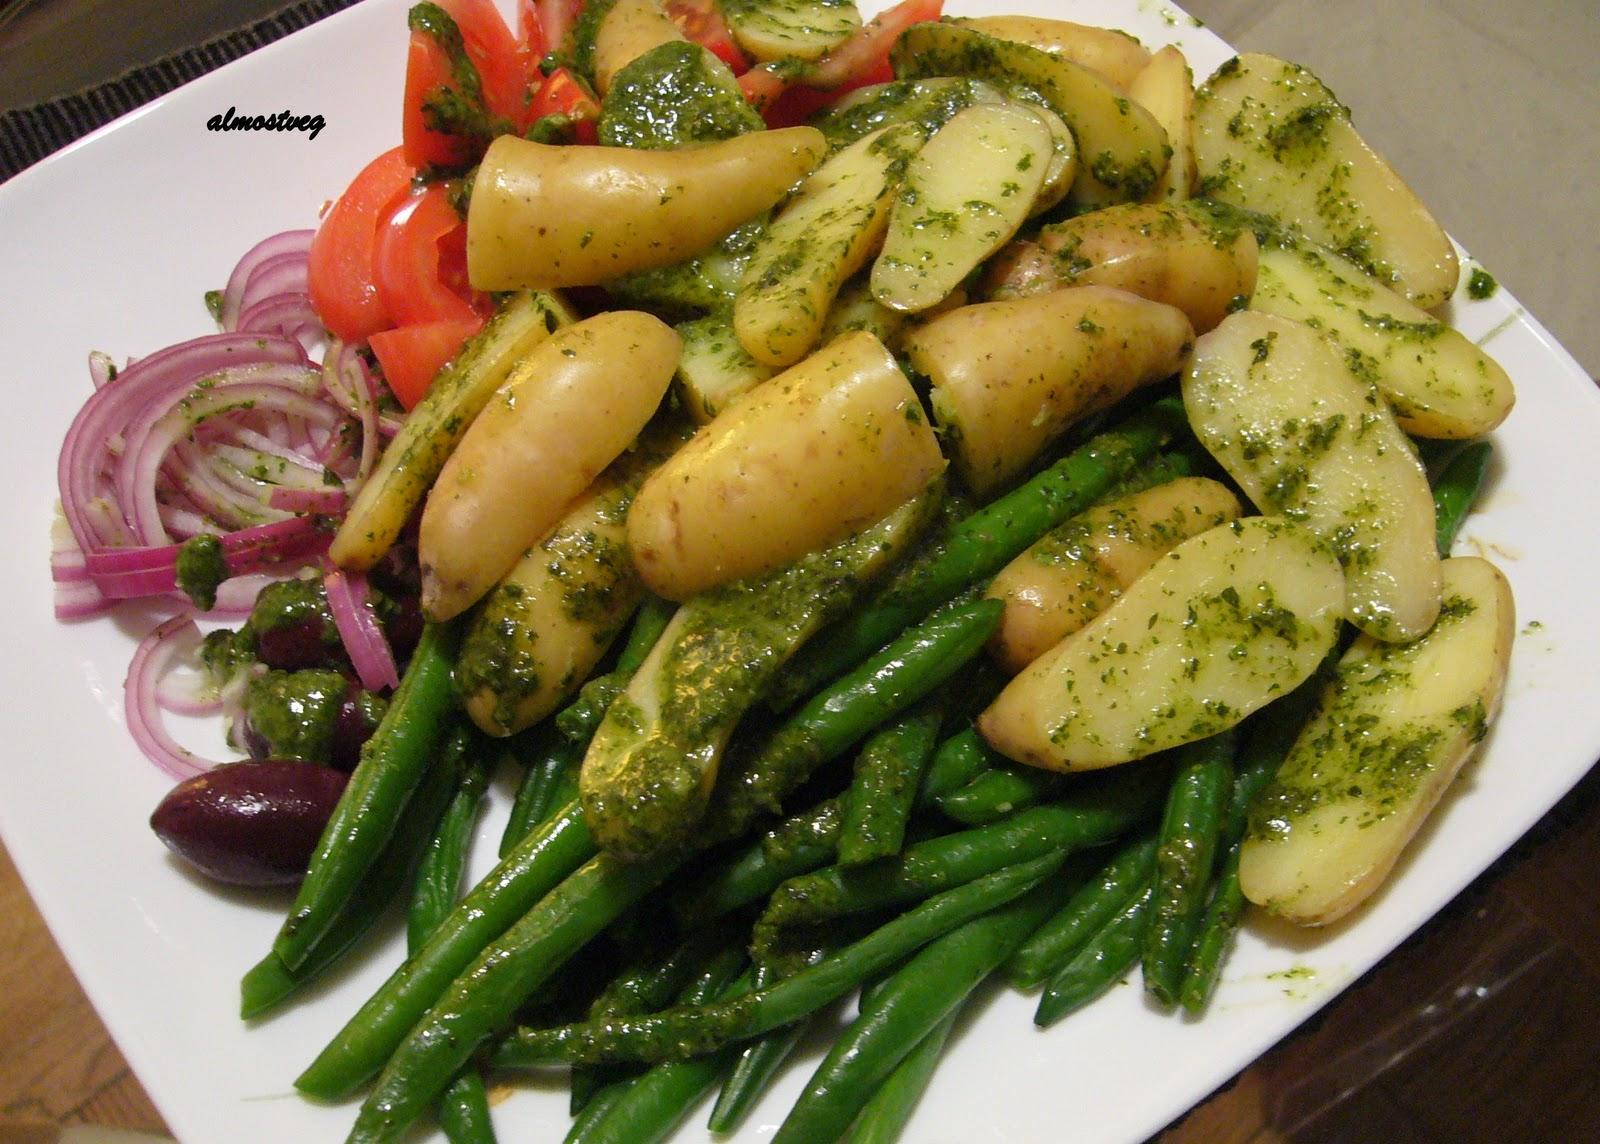 Nicoise salad without Tuna